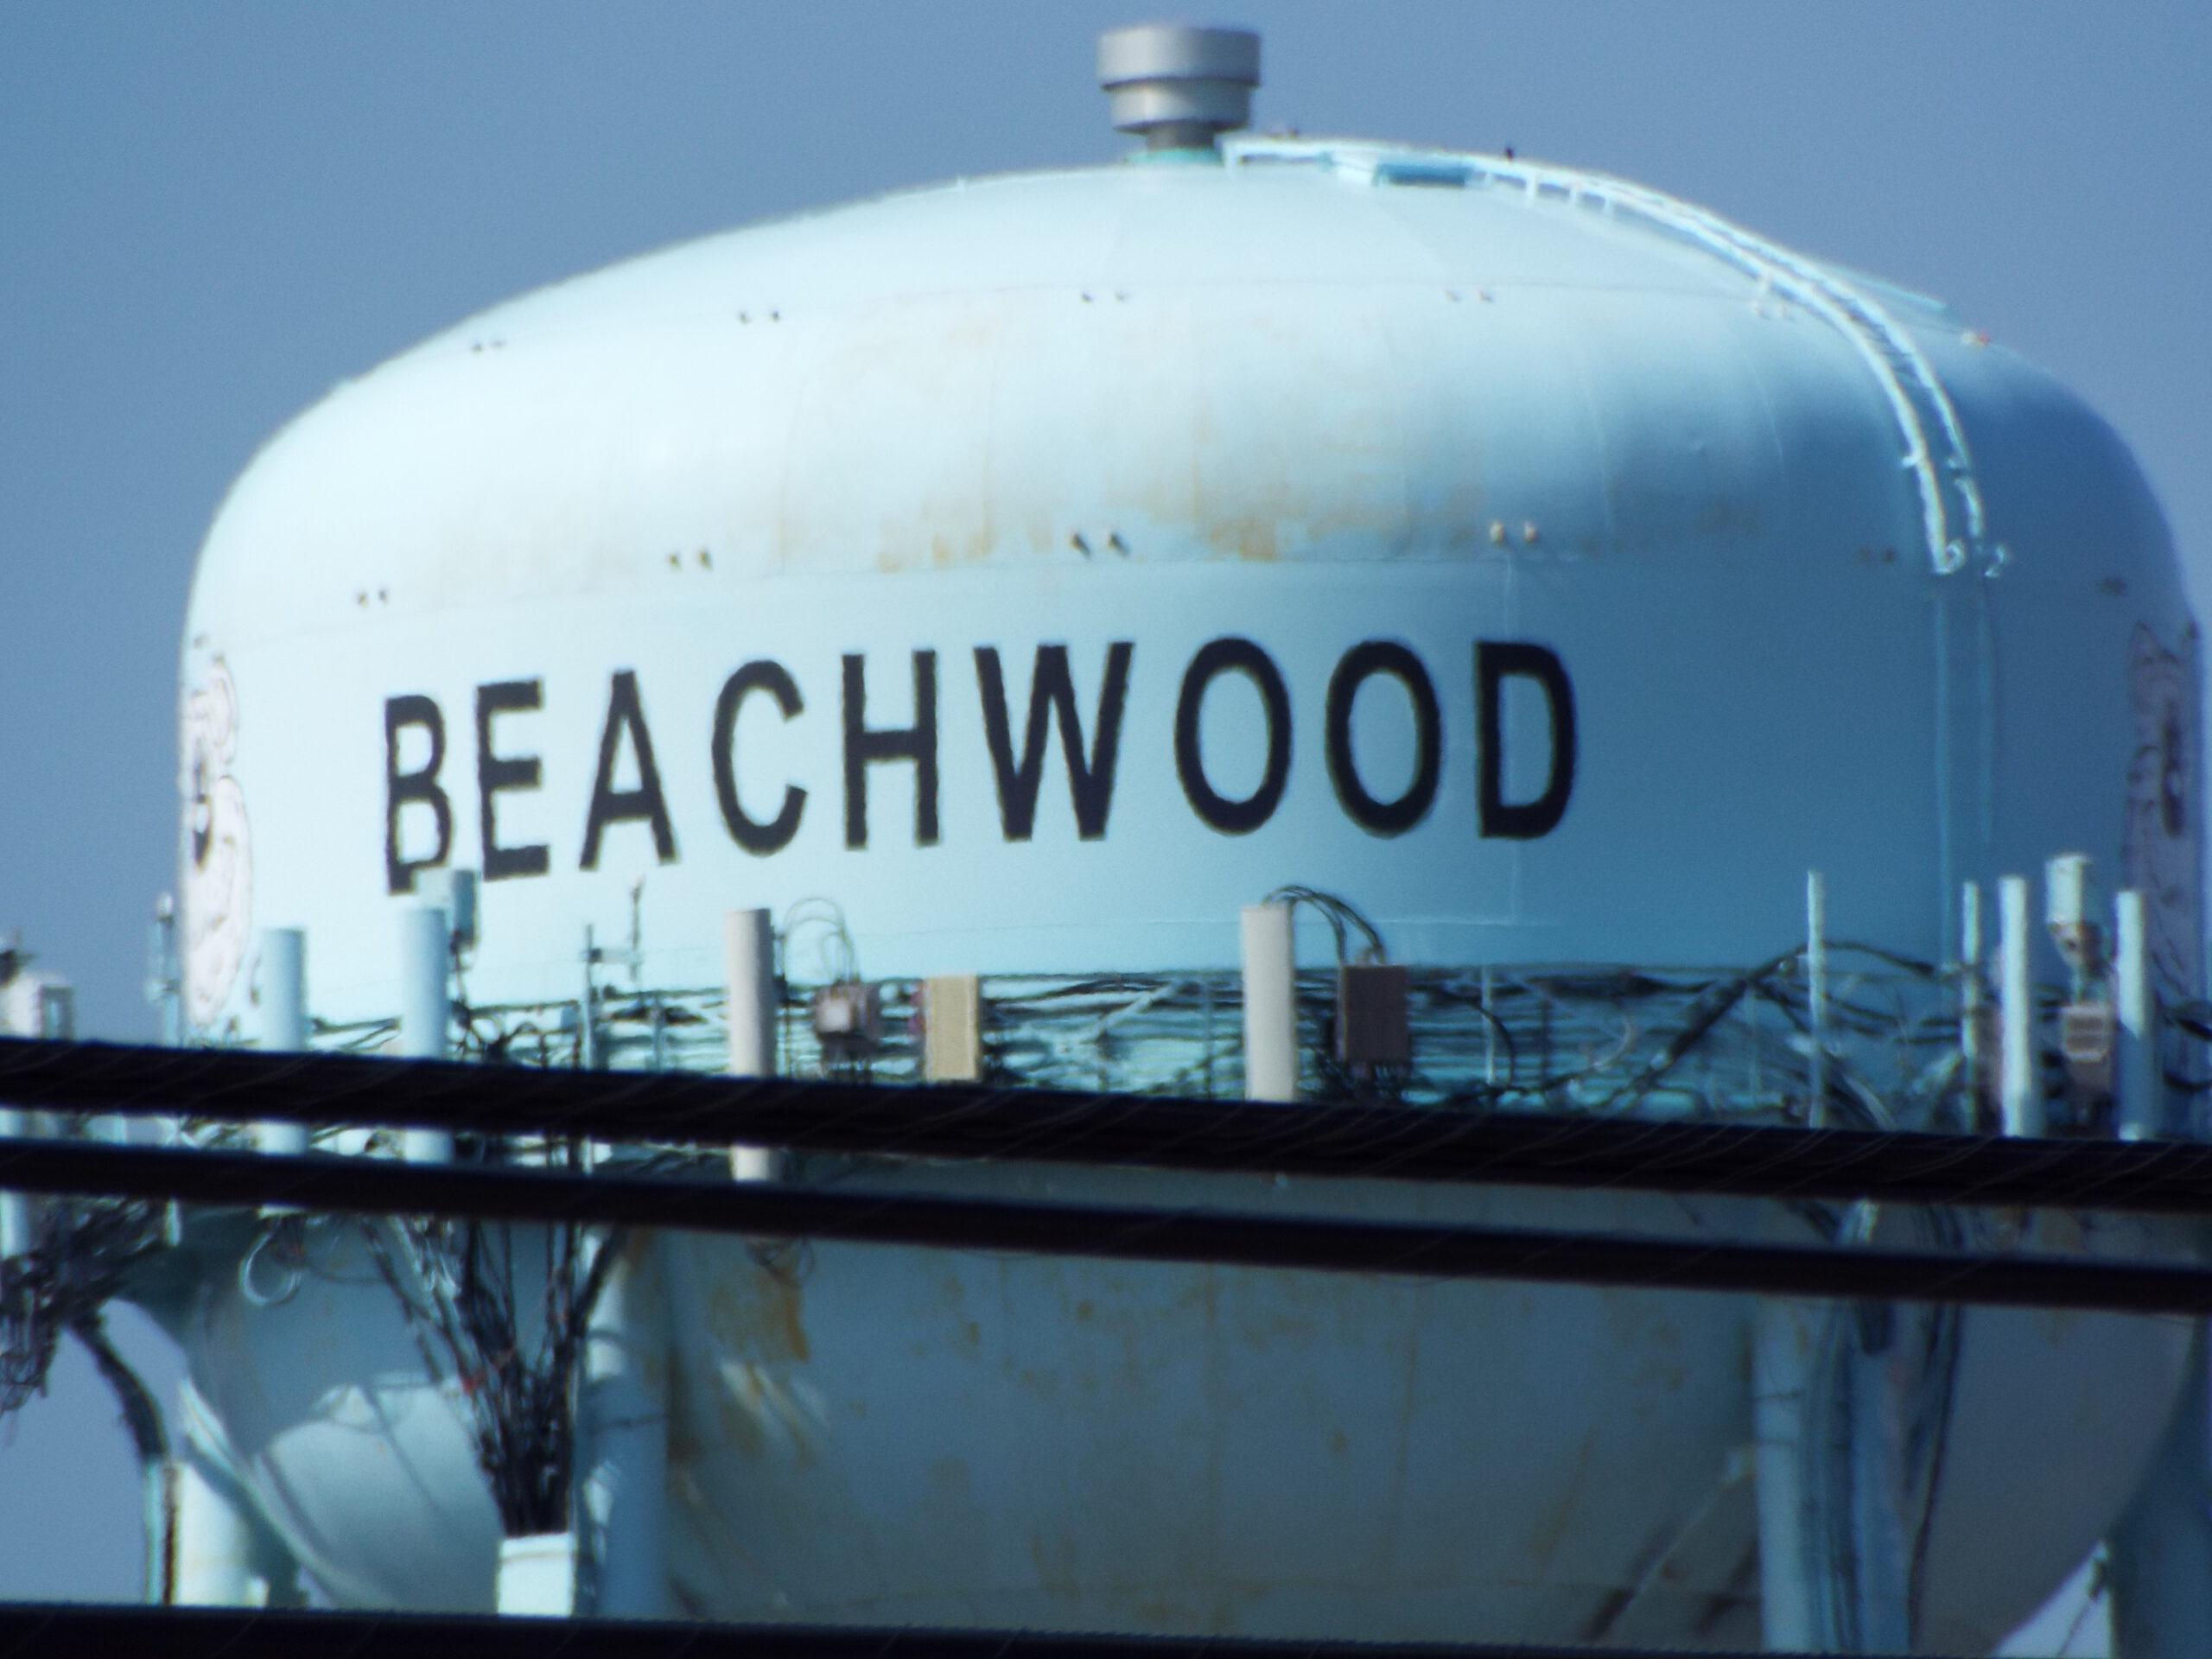 BEACHWOOD: Disturbance- Male Party Destroying Residence on Heroin